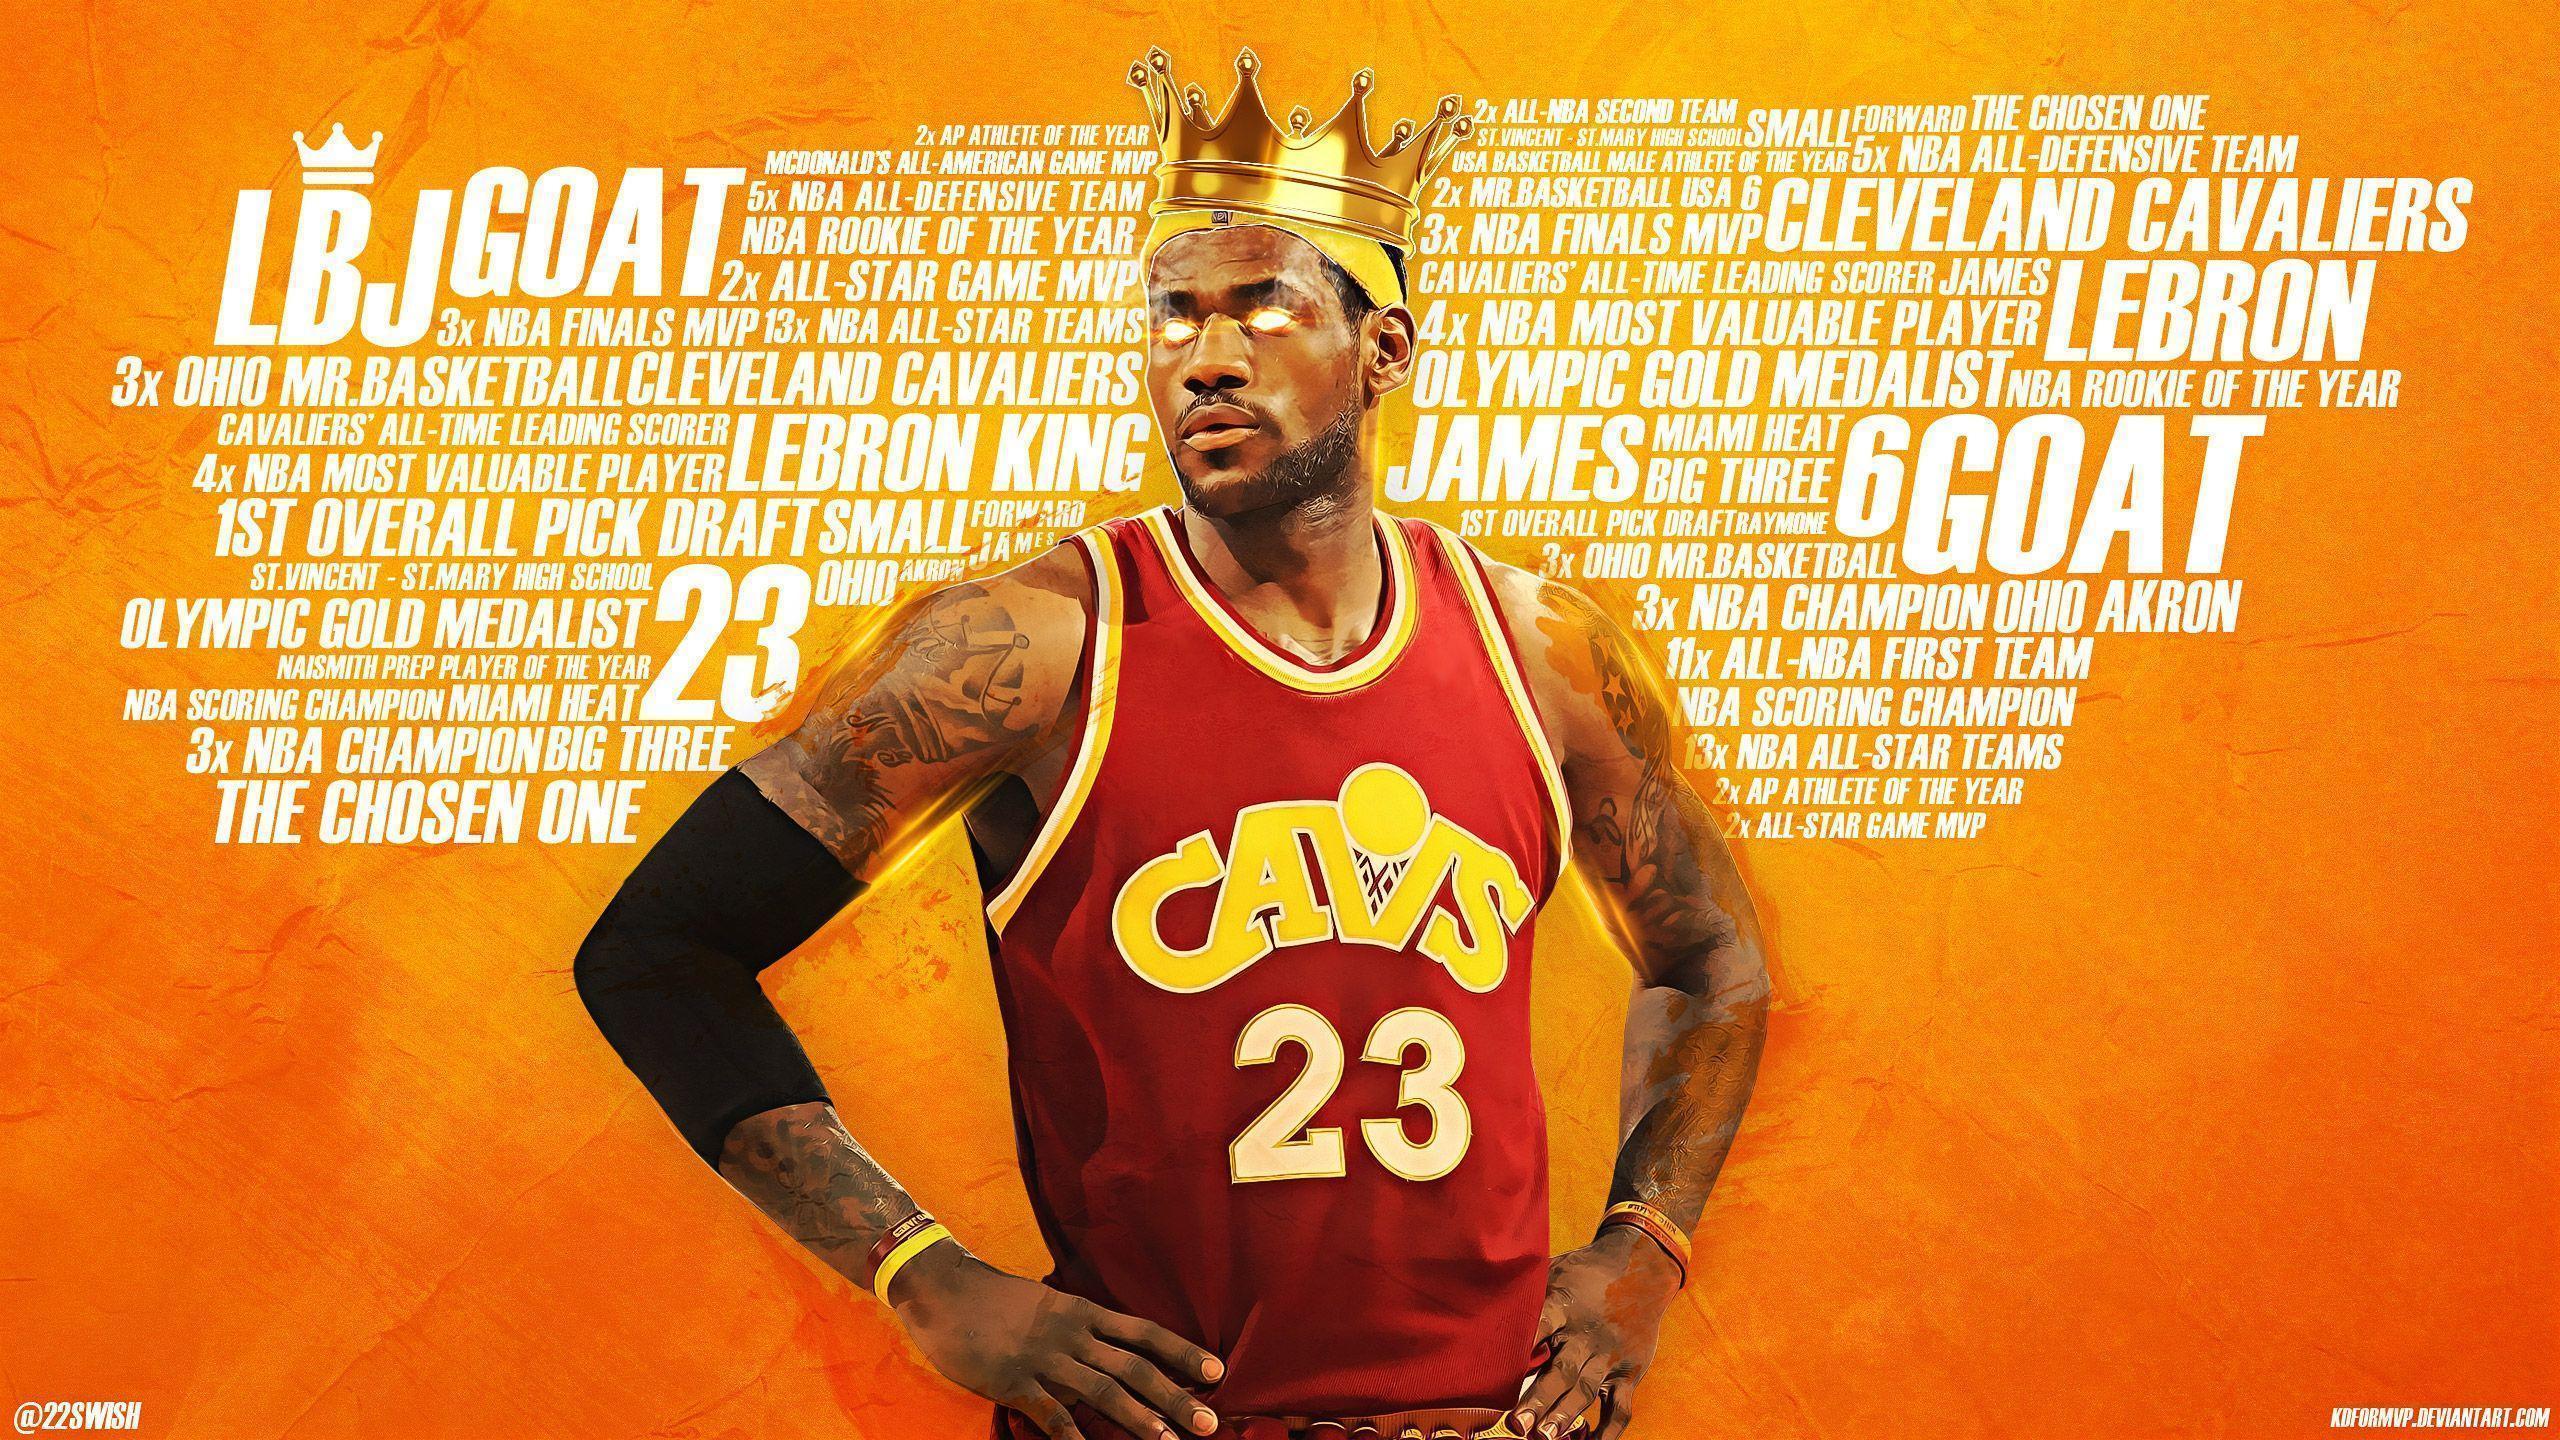 Cool Nba Players Wallpapers: NBA Player Wallpapers